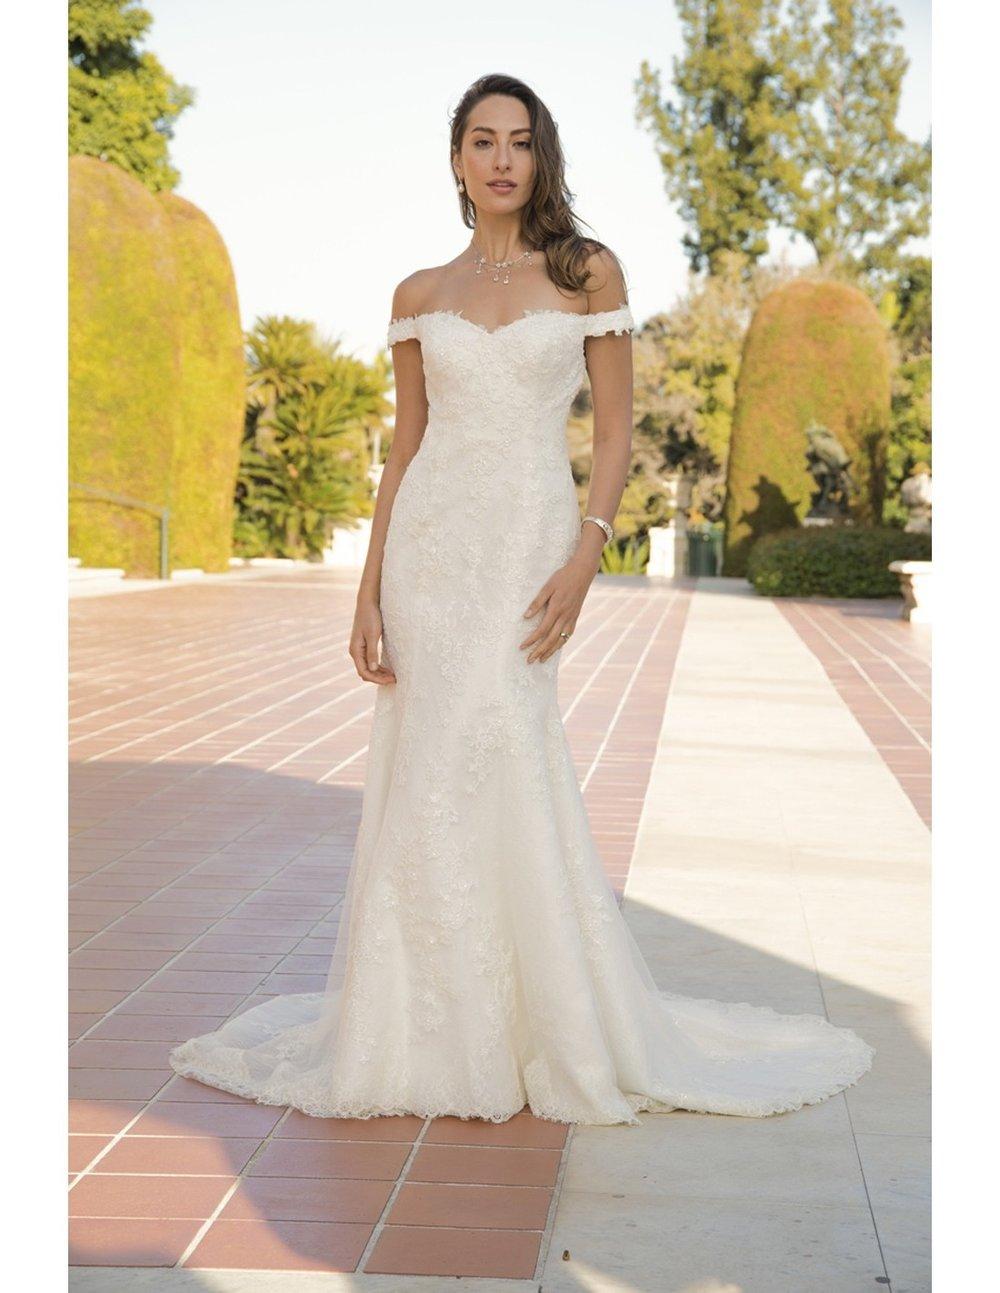 Venus Bridal AT4714  size 16             Call for Pricing